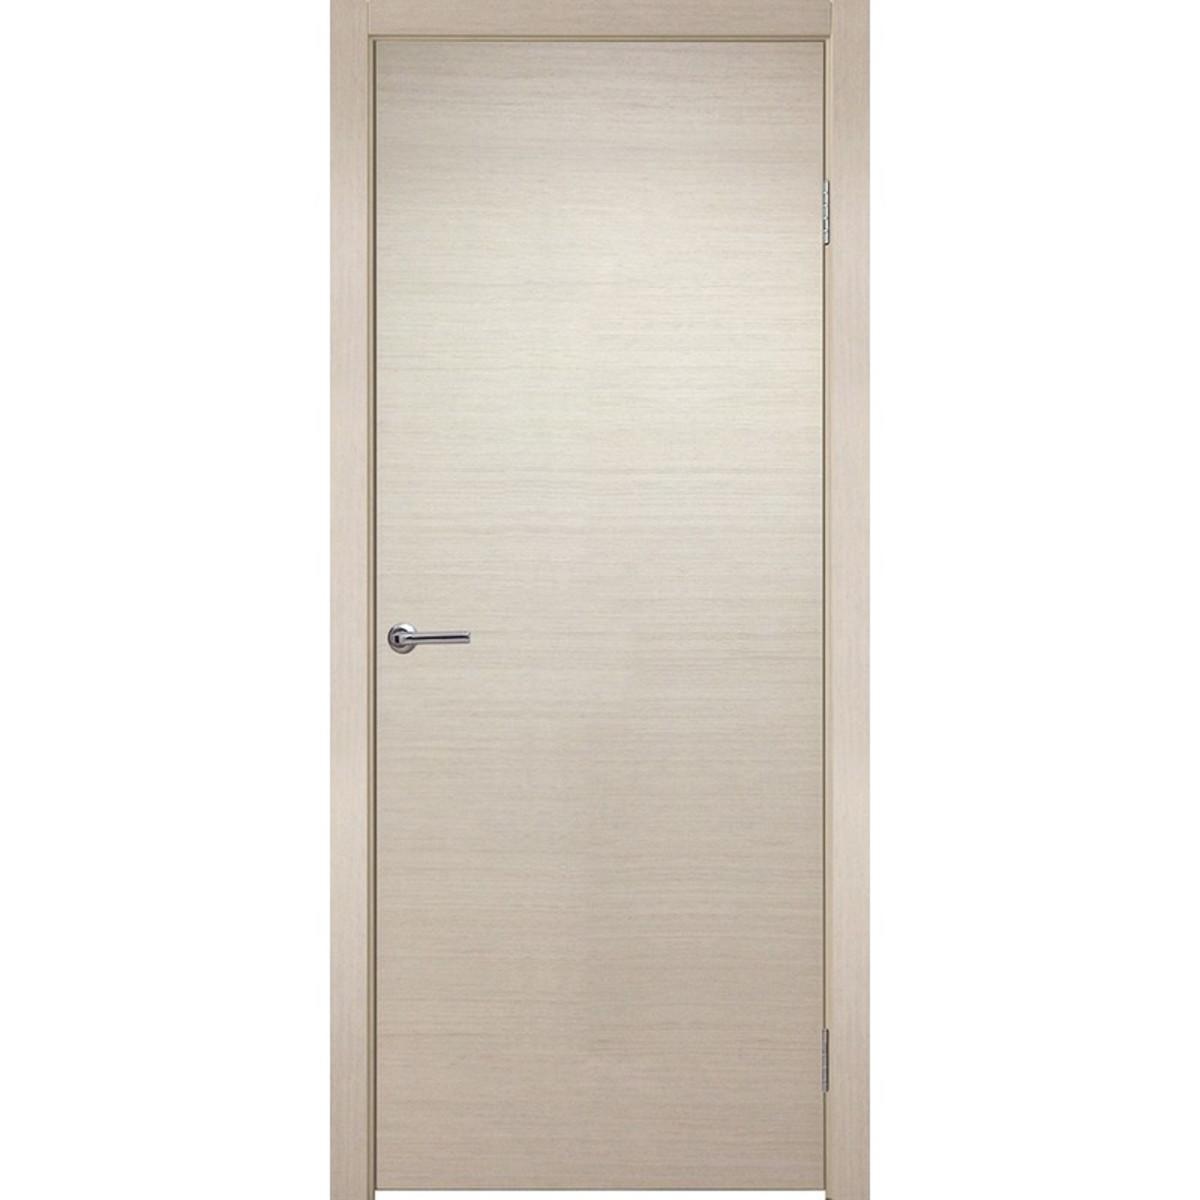 Дверь Межкомнатная Глухая Шарлотт 60x200 Шпон Цвет Дуб Белёный